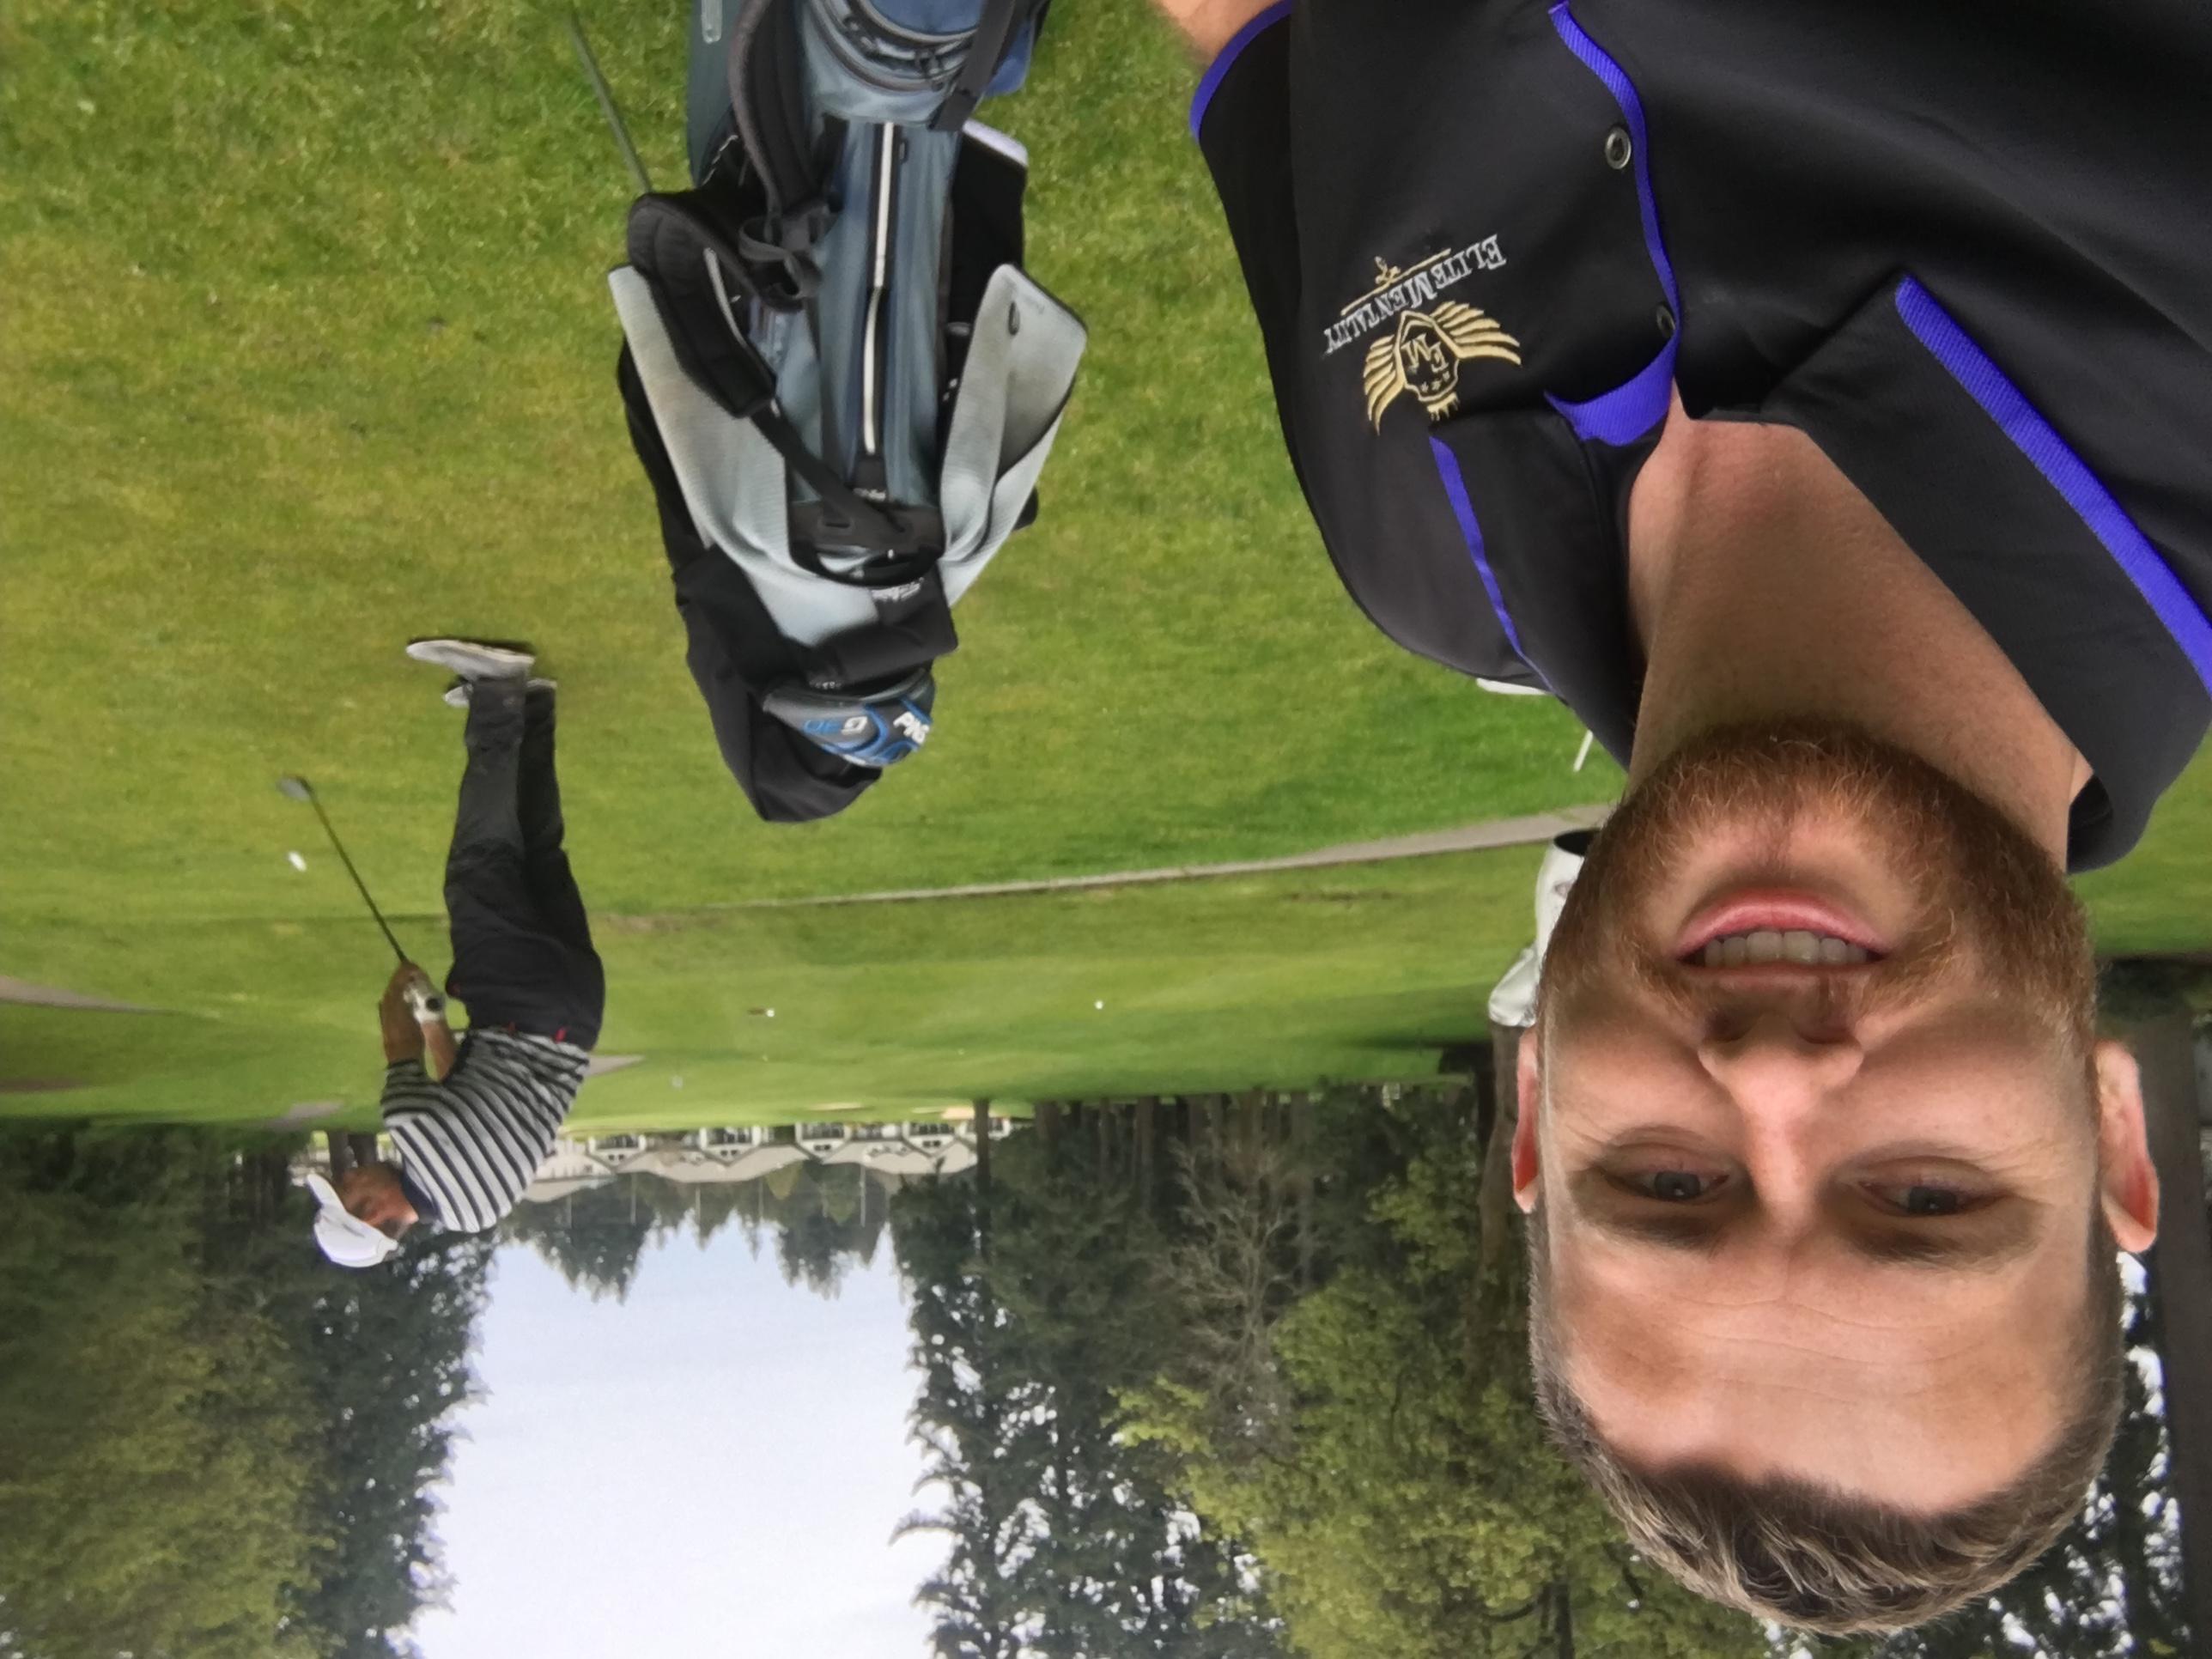 Observing golf